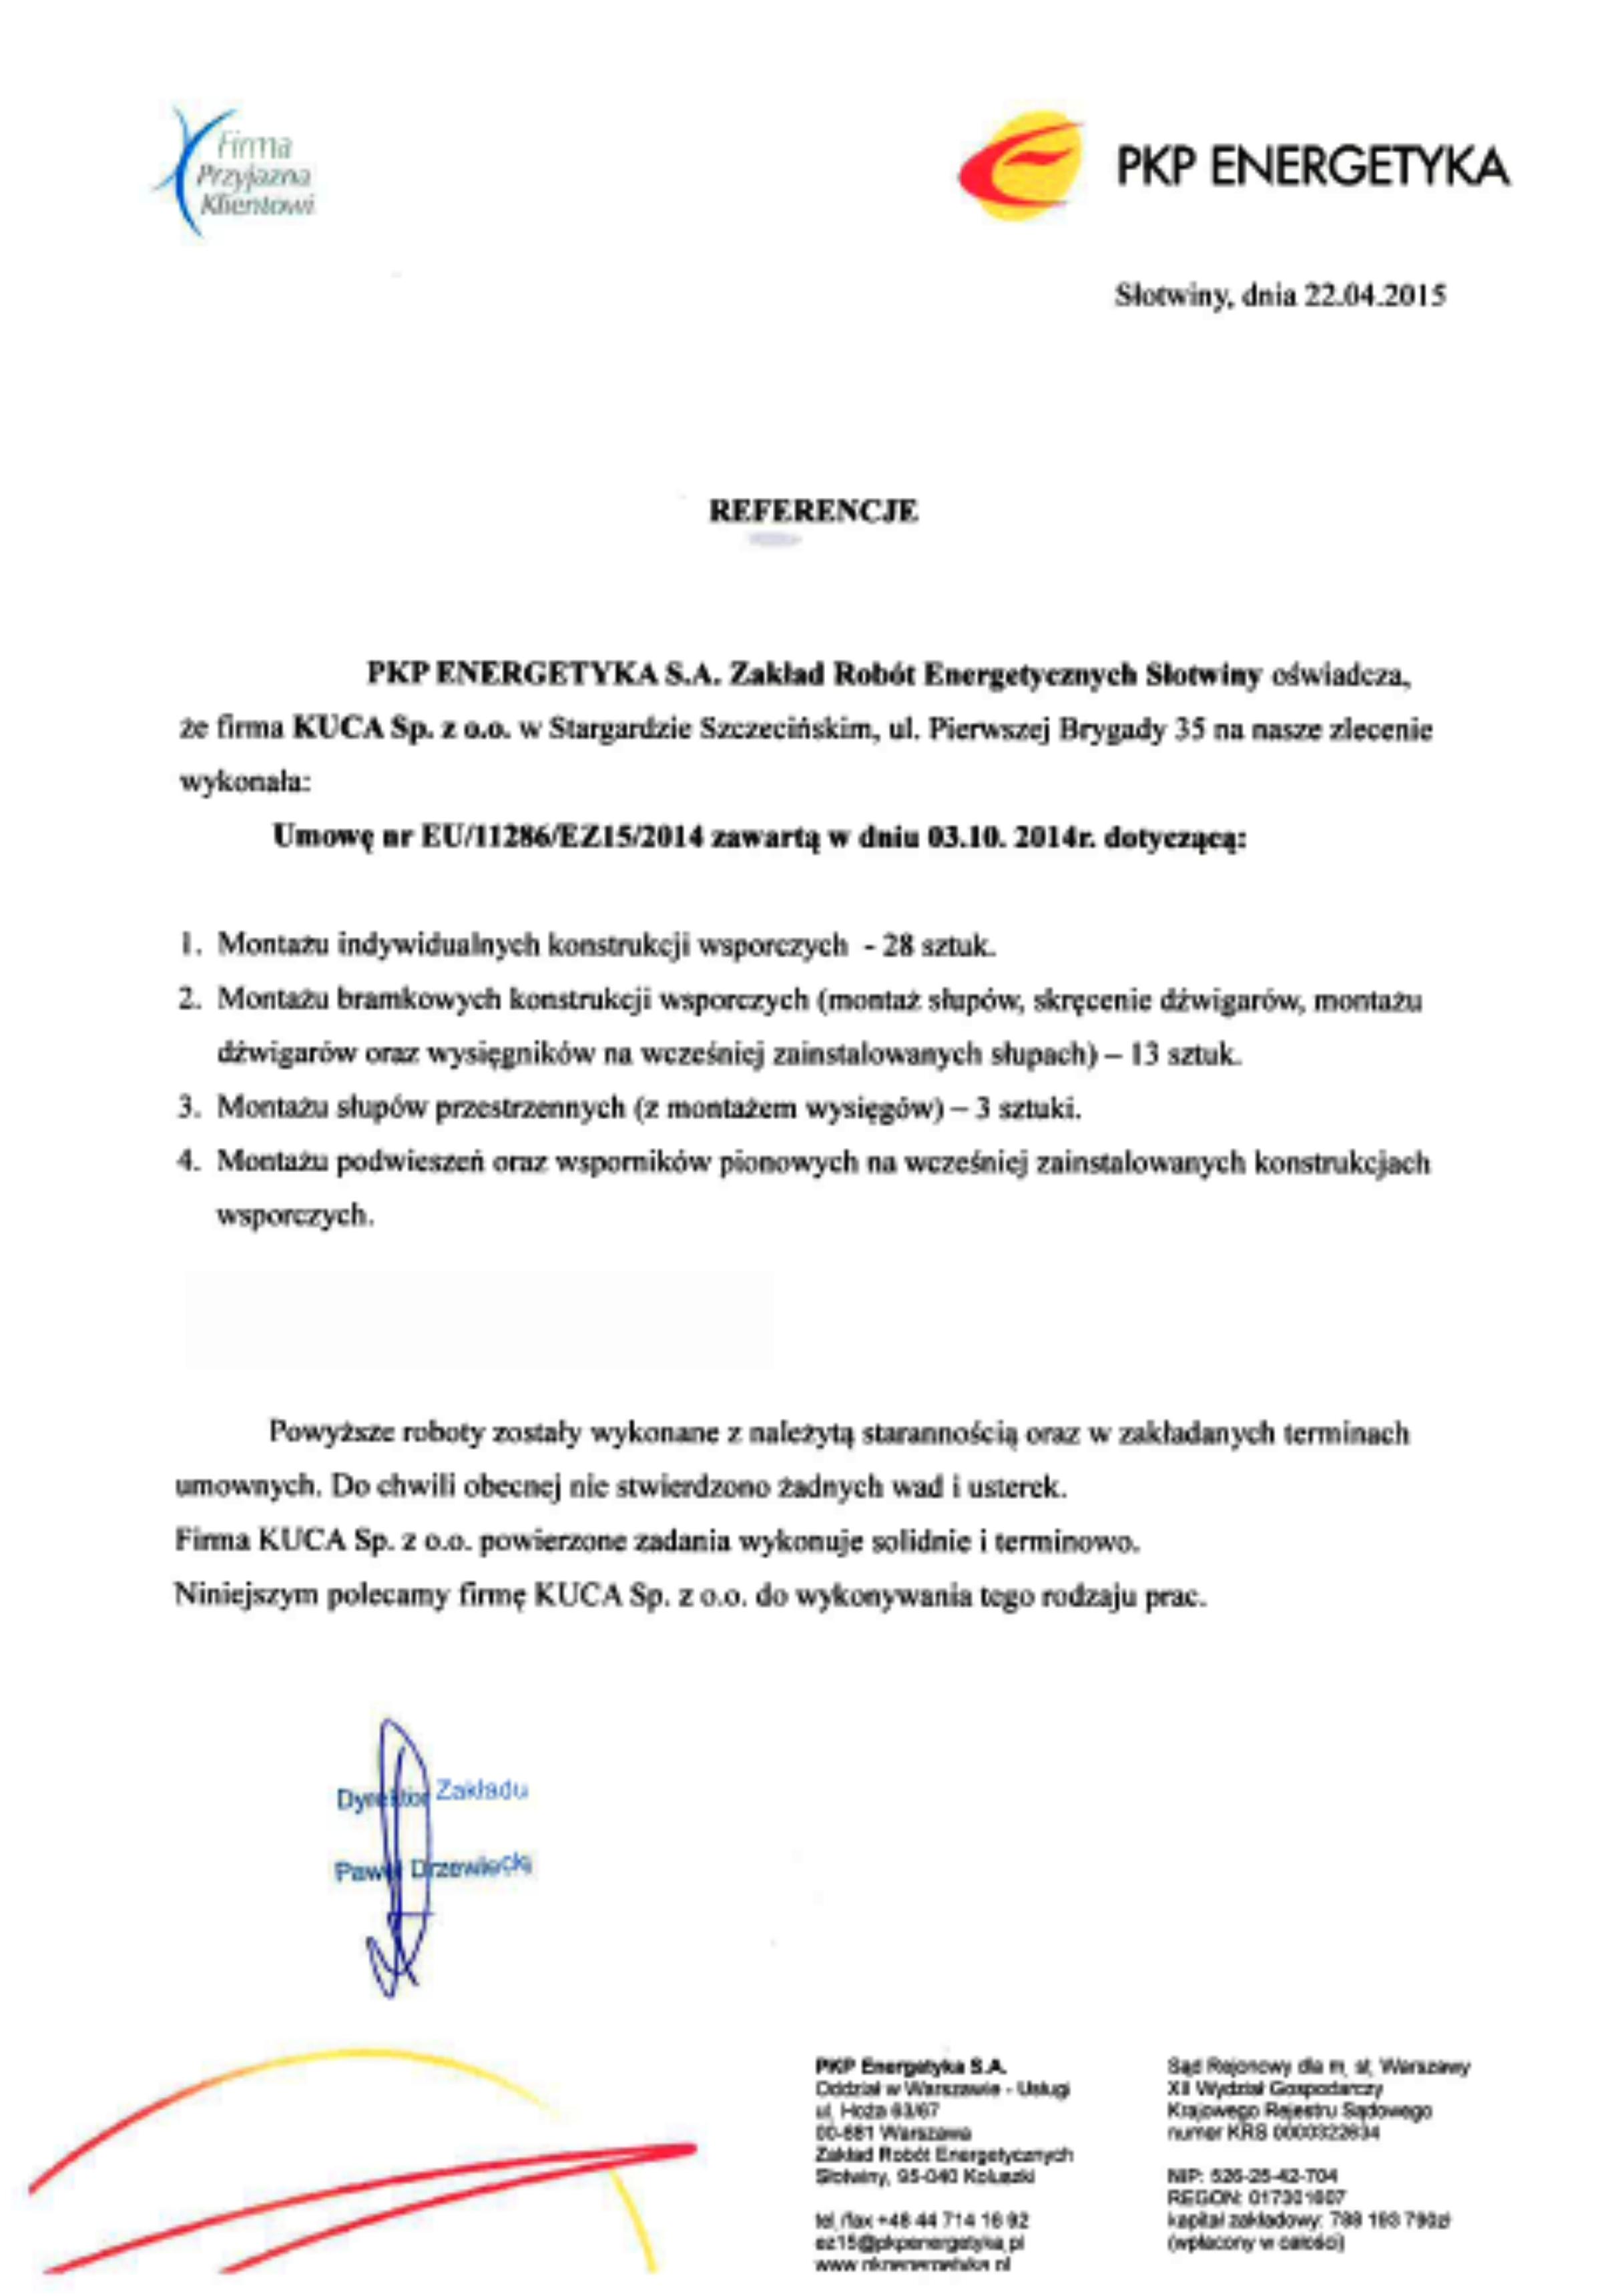 Referencje PKP ENERGETYKA 22.04.2015_v2